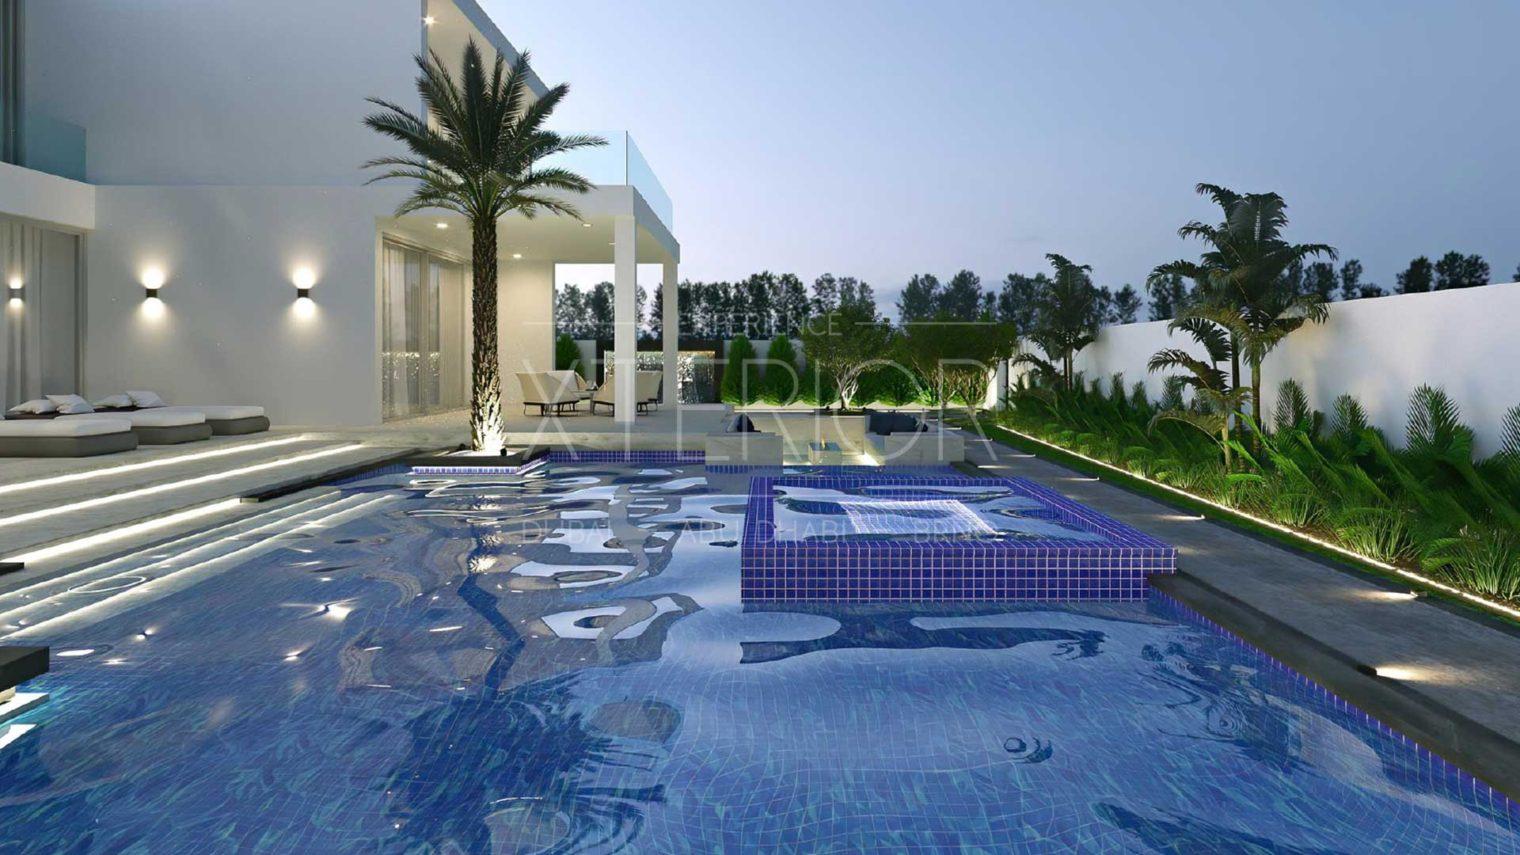 Pool outdoor area design